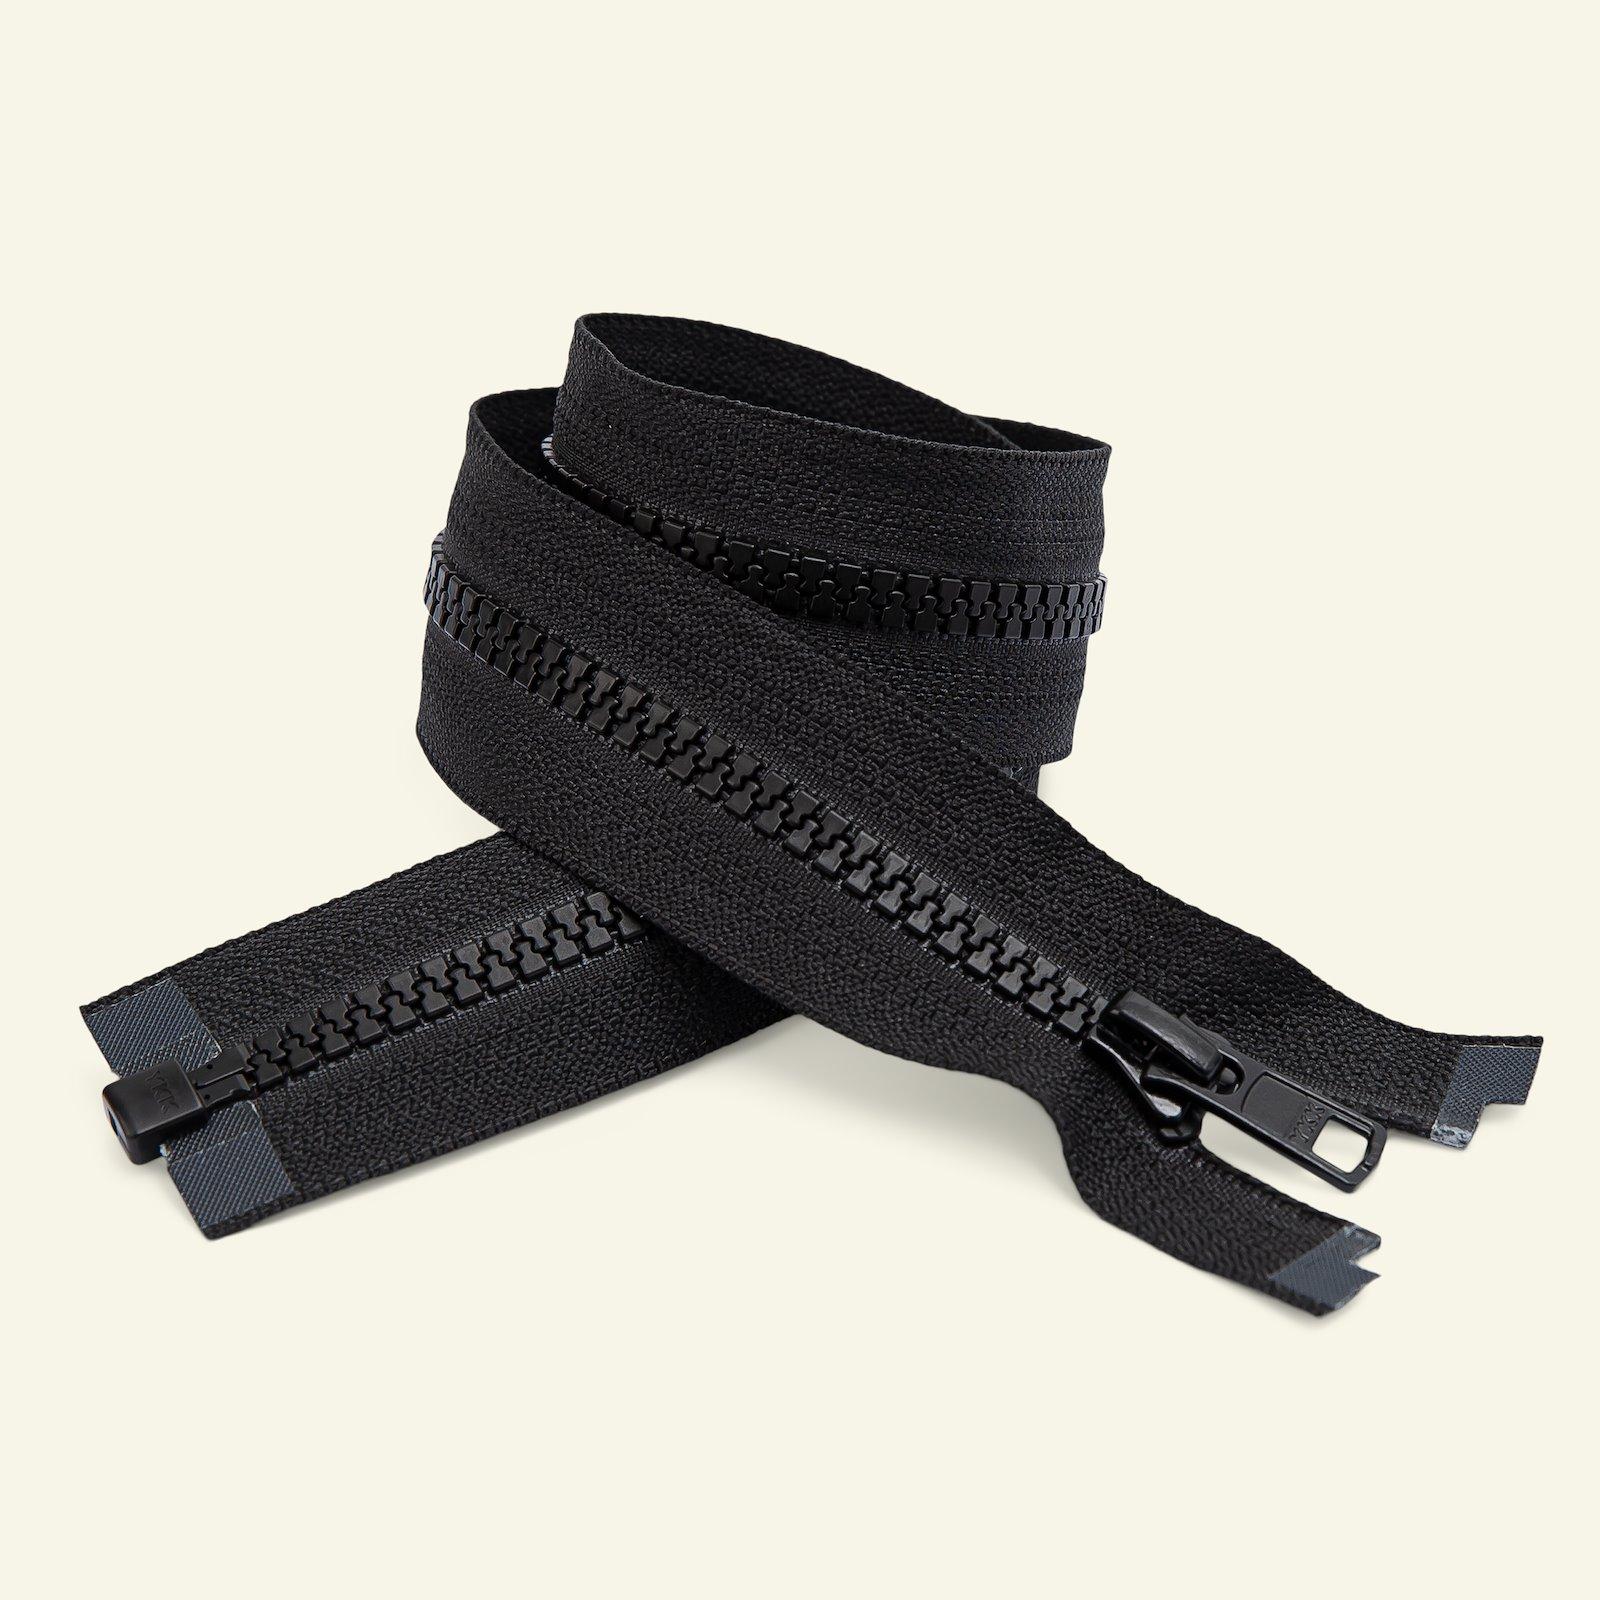 YKK zip 6mm open end 80cm black x50043_pack